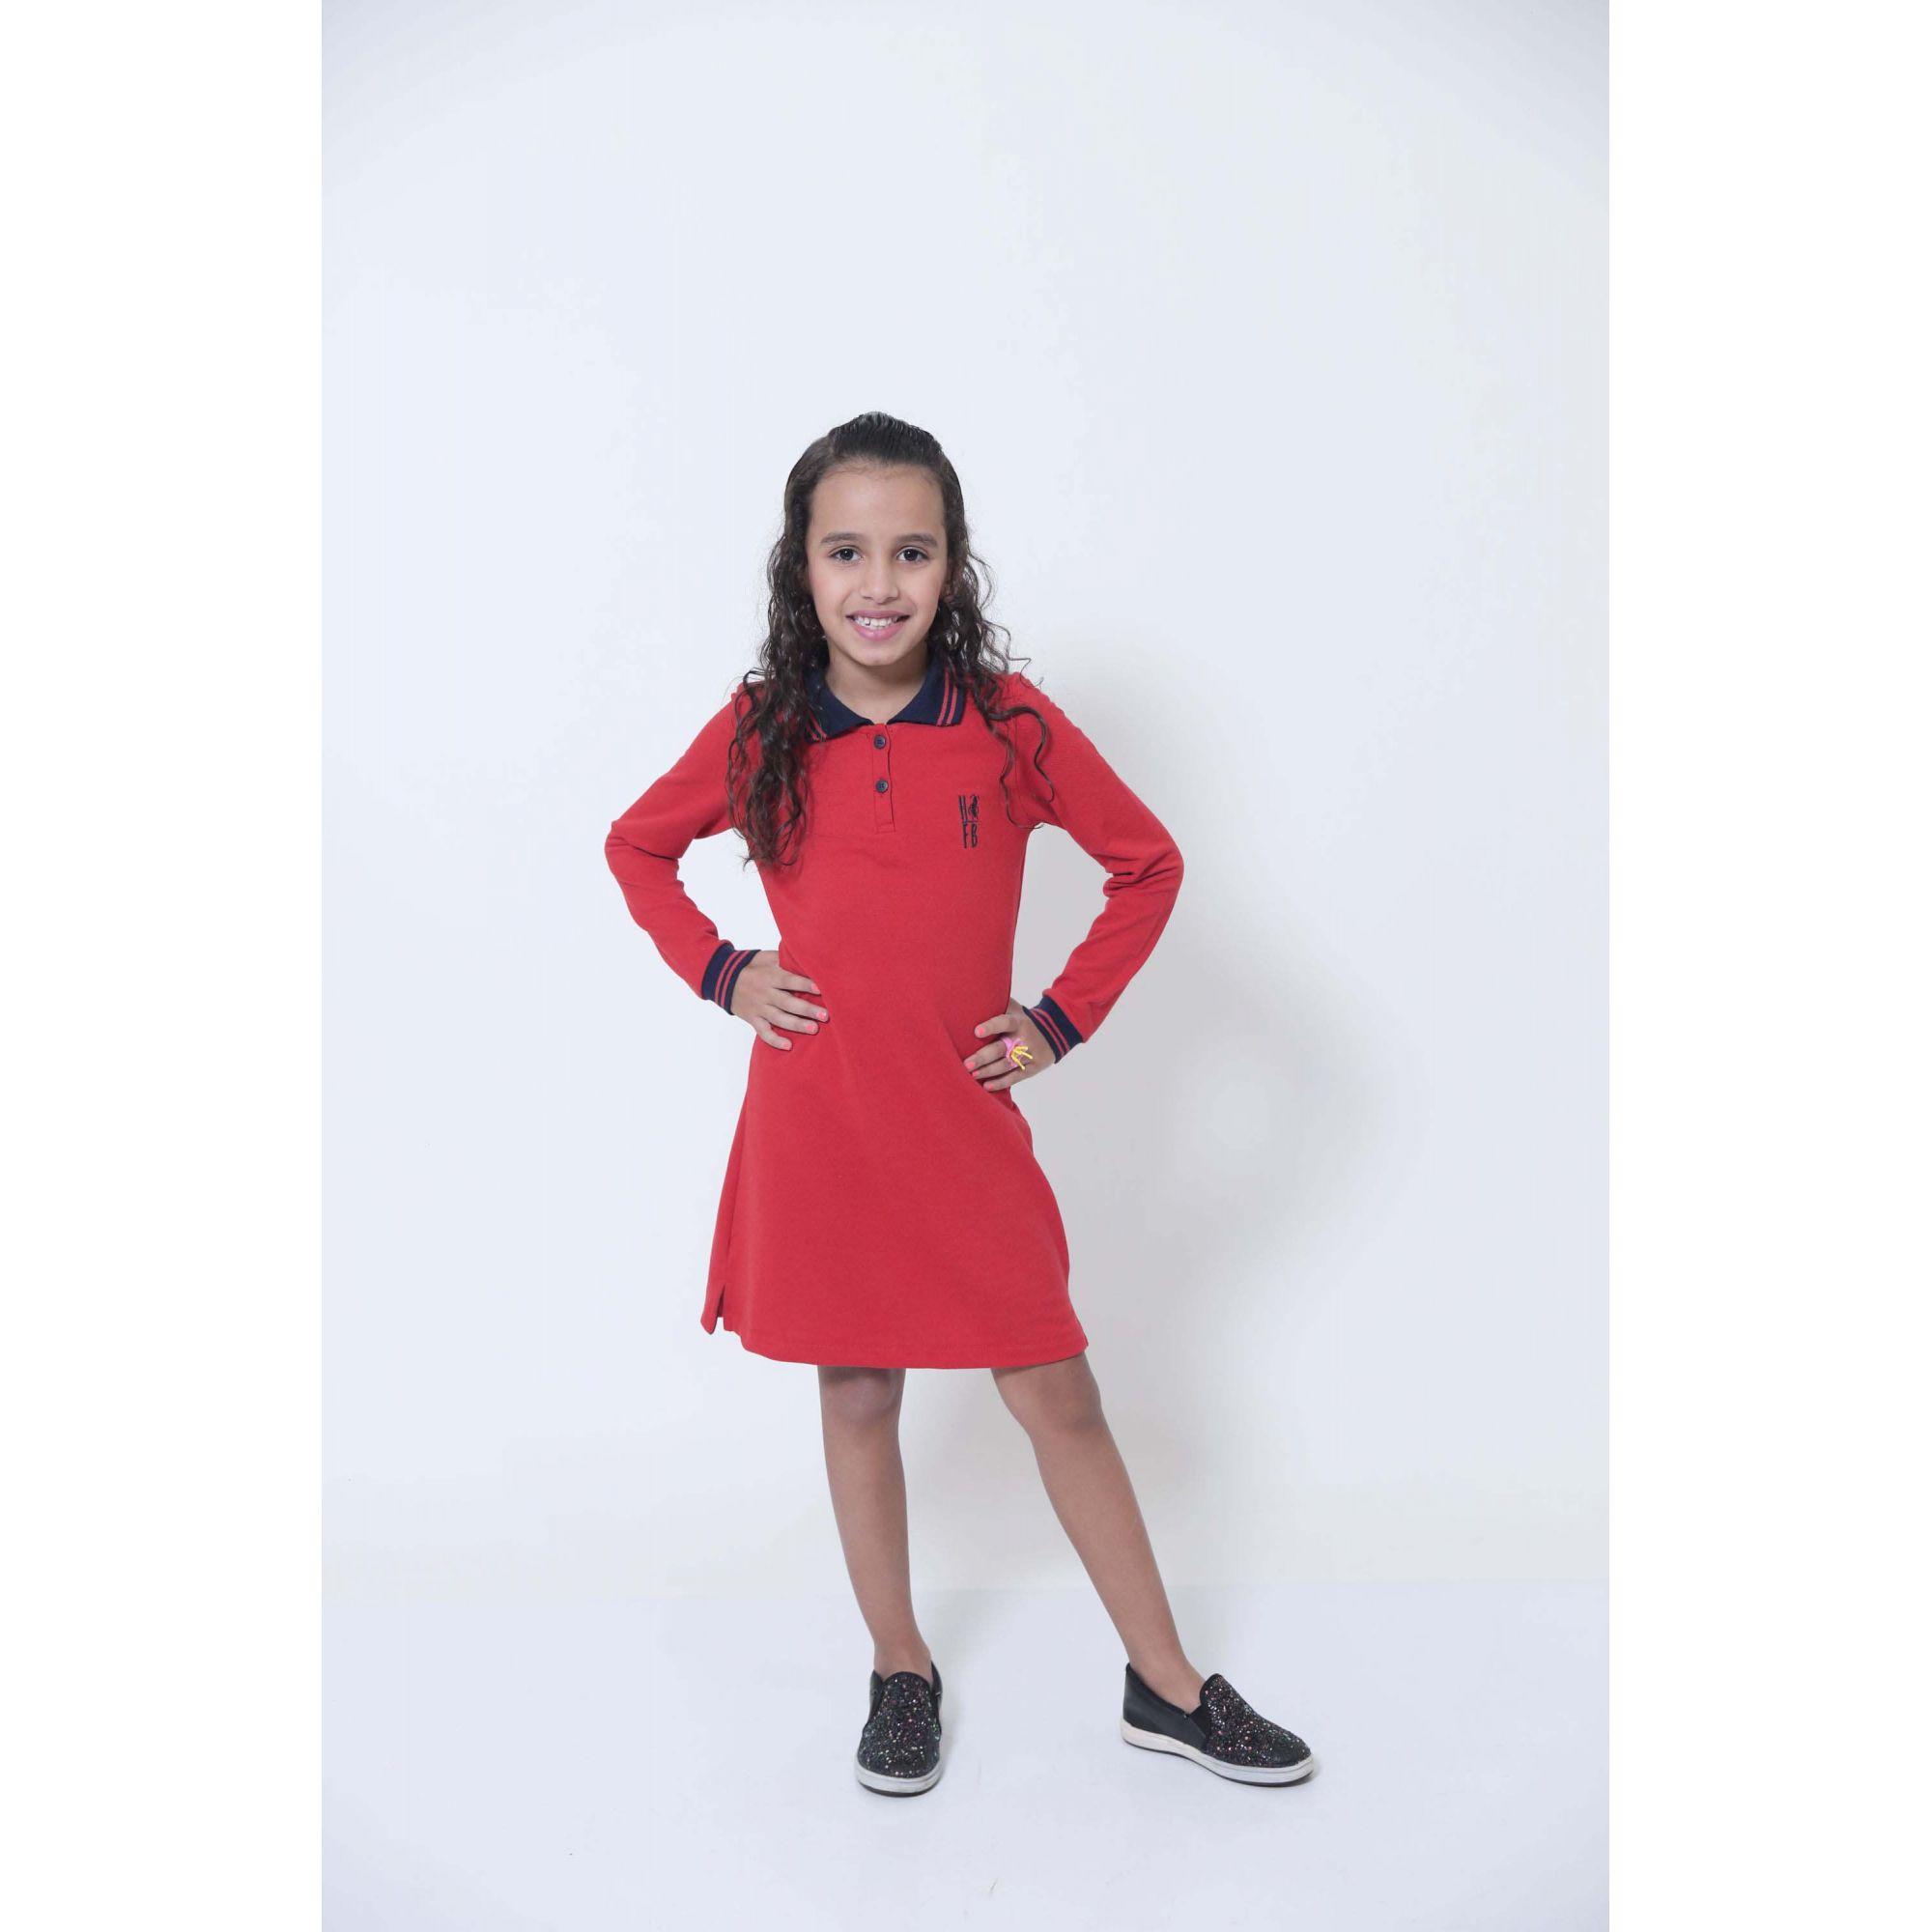 PAI E FILHA > Kit 02 Peças Camisa + Vestido Polo Infantil Vermelho Manga Longa [Coleção Tal Pai Tal Filho]  - Heitor Fashion Brazil